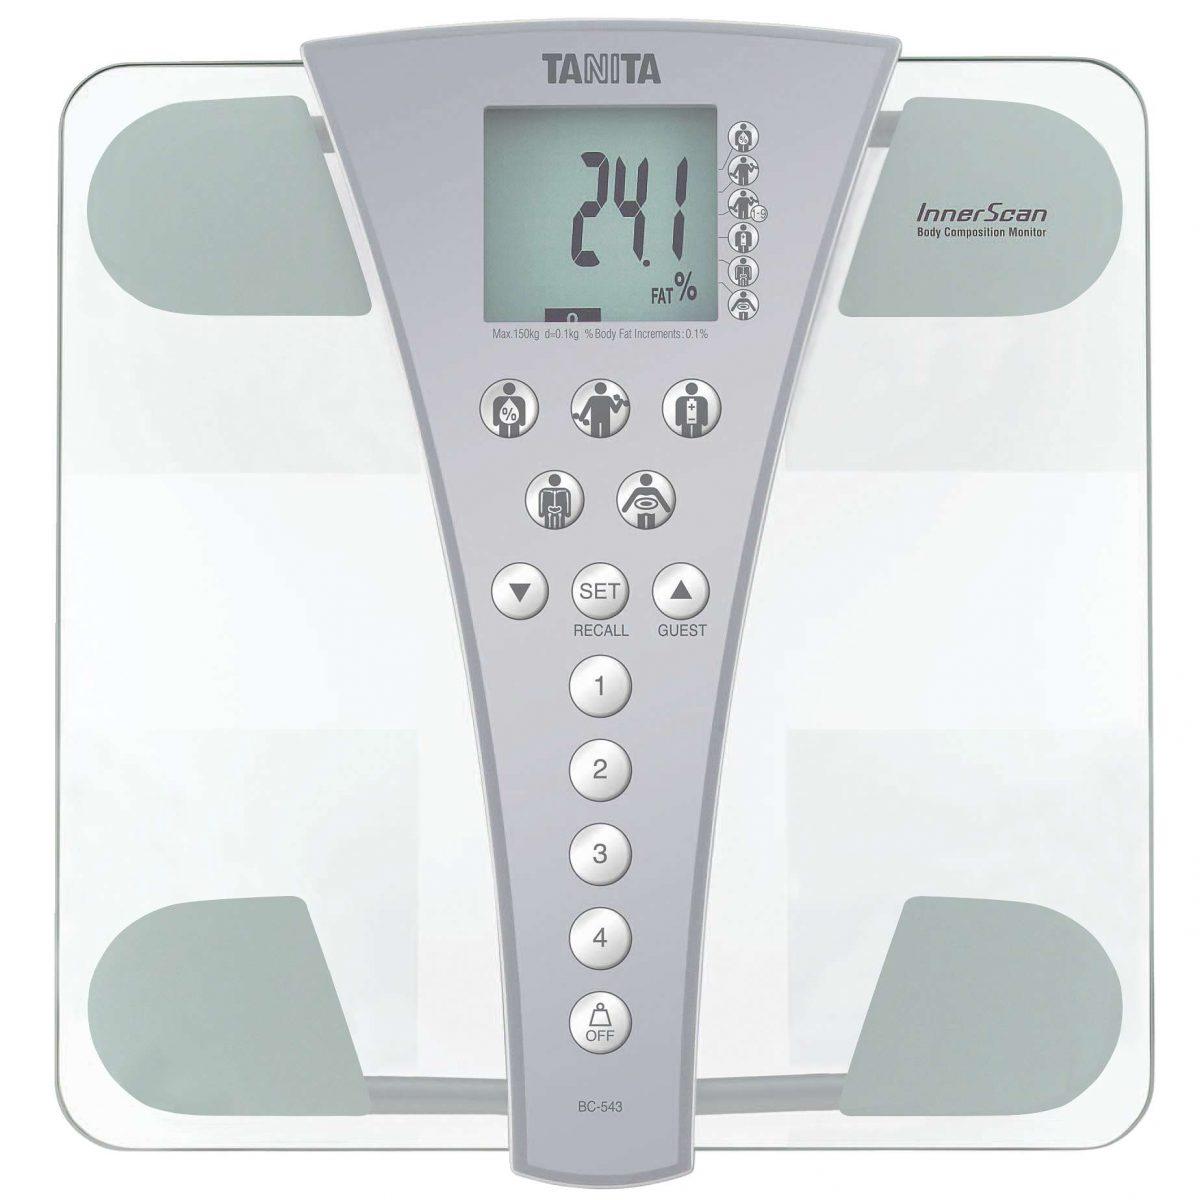 Tanita Körperanalysewaage BC-543 - Fitnessgeräte - Tanita